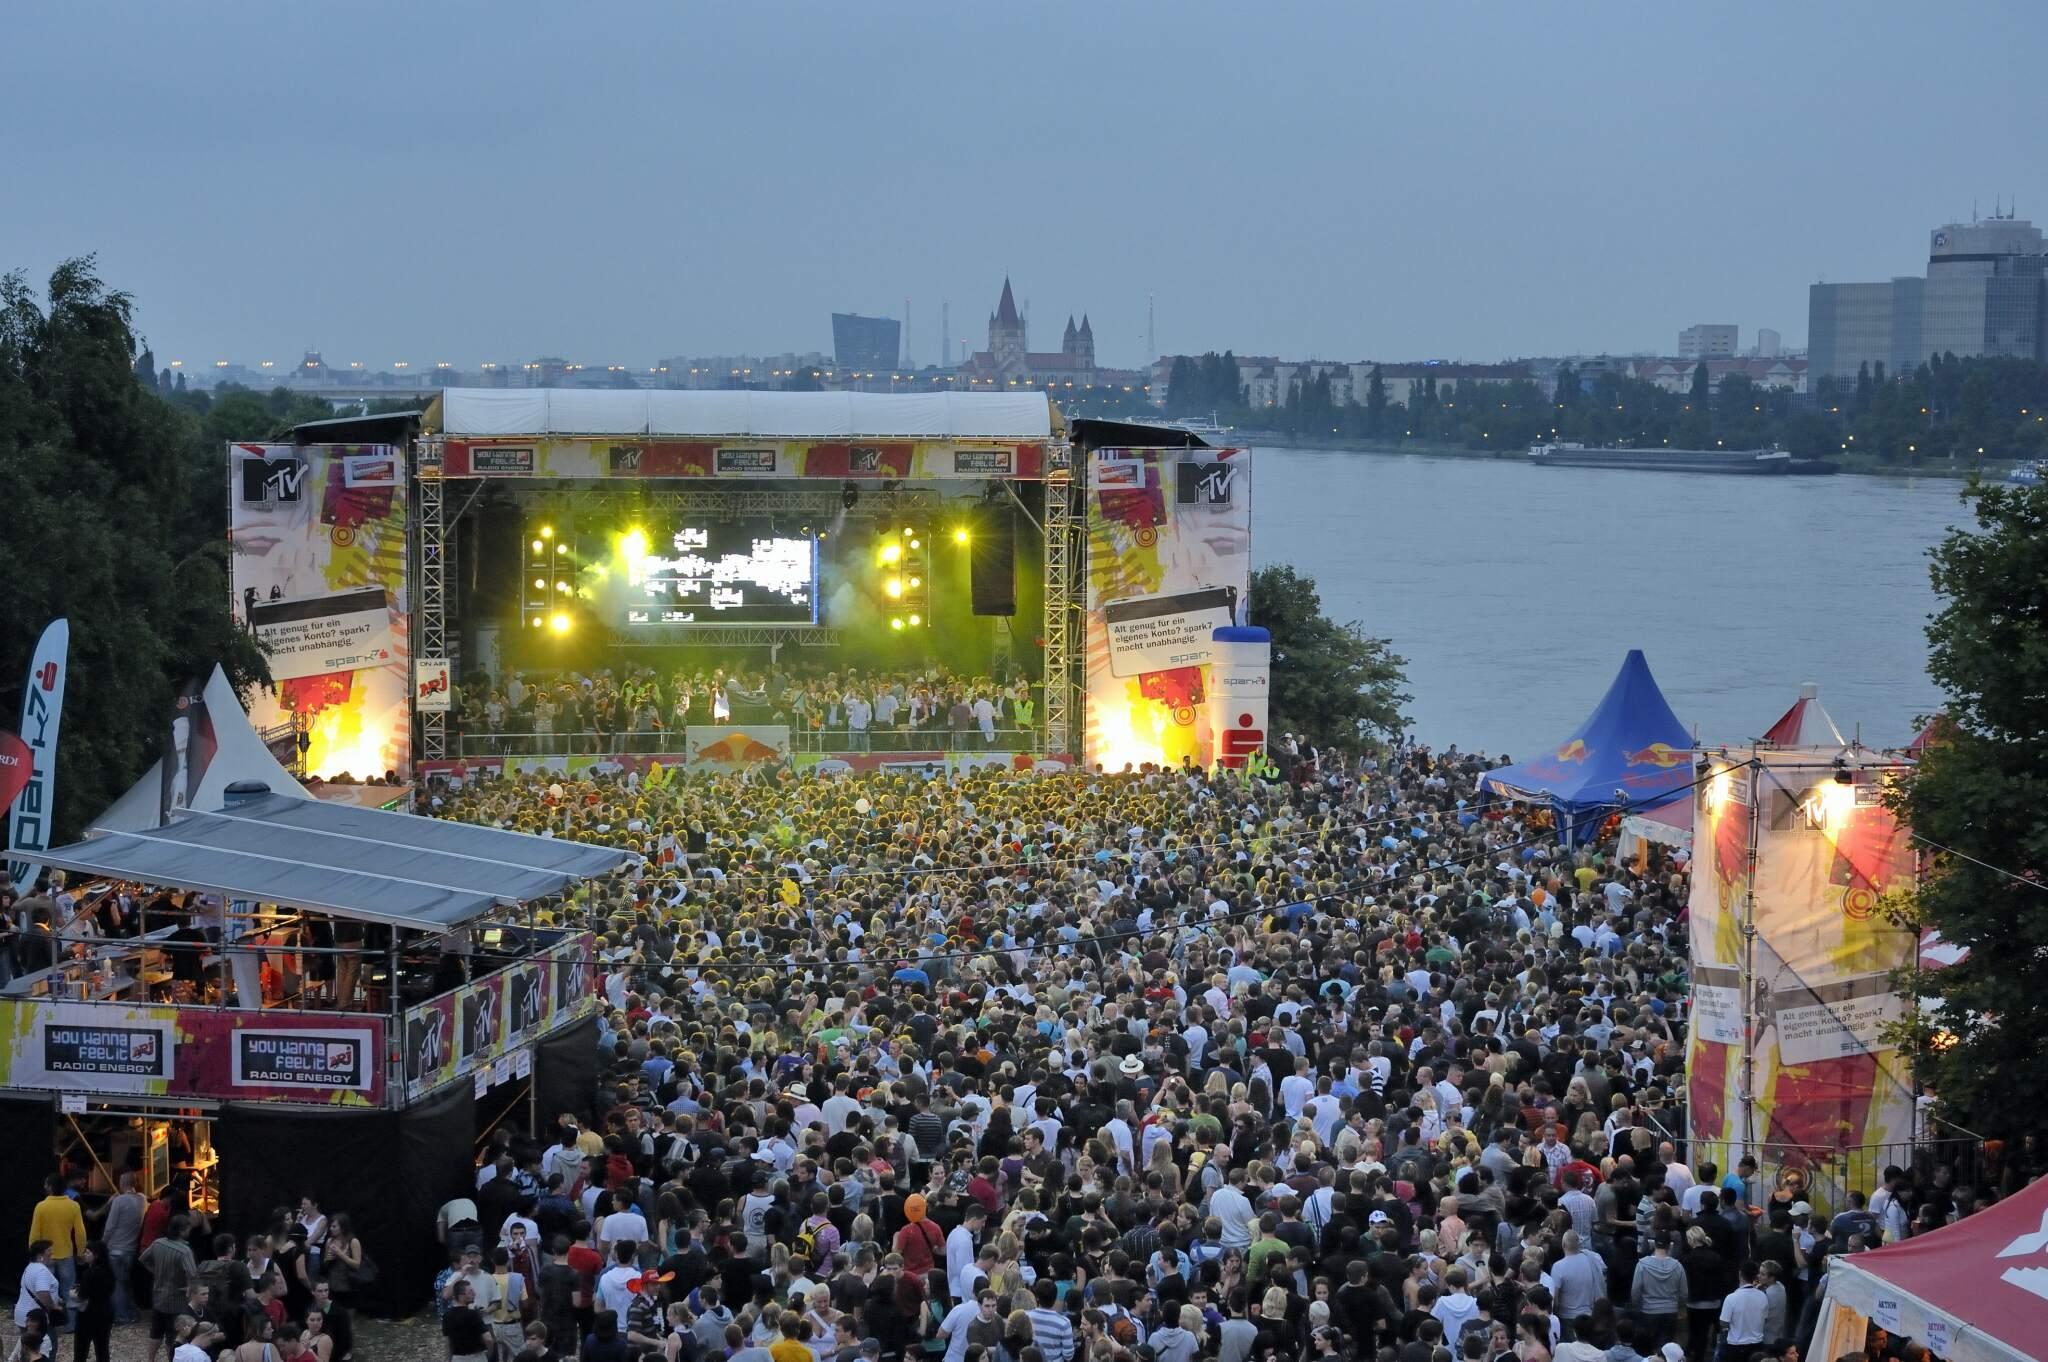 Donauinselfest Auf 18 20 September 2020 Verschoben Dfz Die Floridsdorfer Zeitung